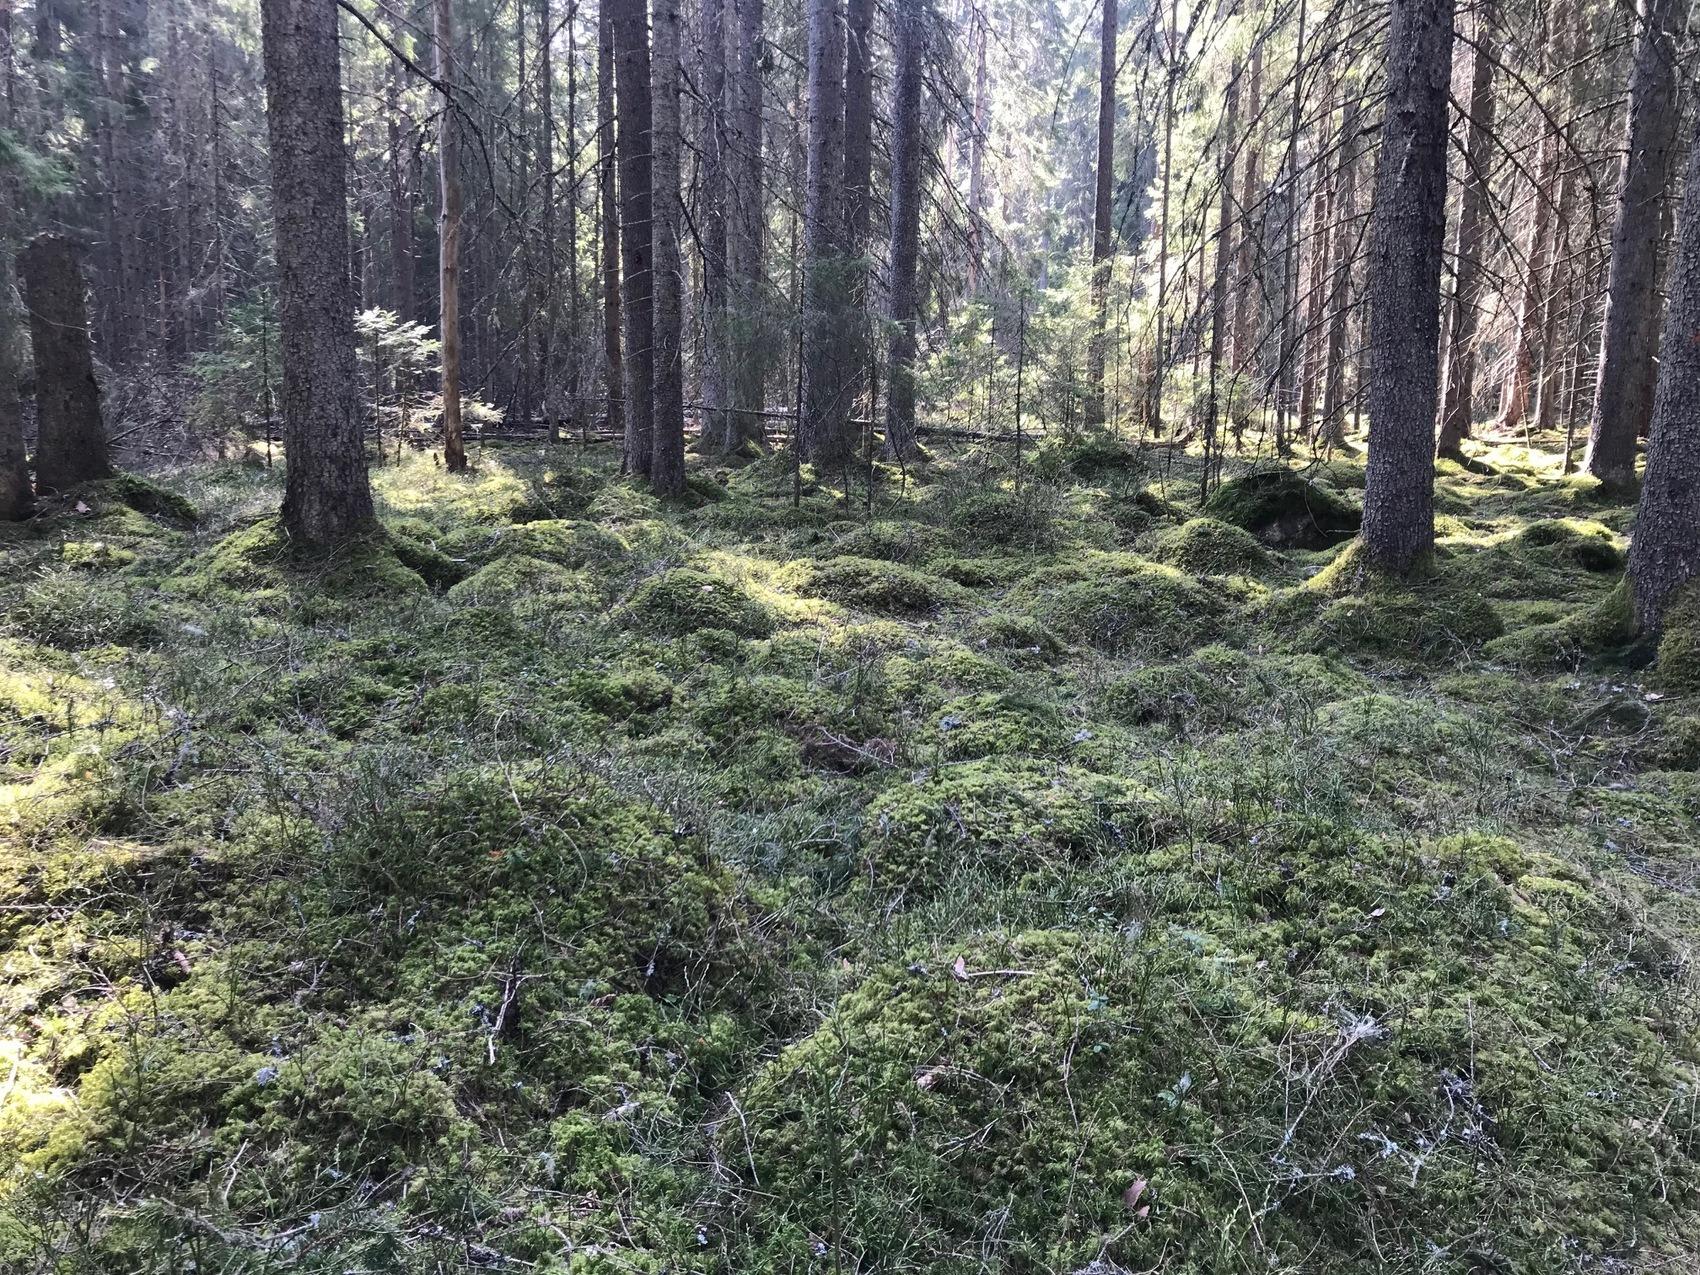 Mossiga kullar i tät skog